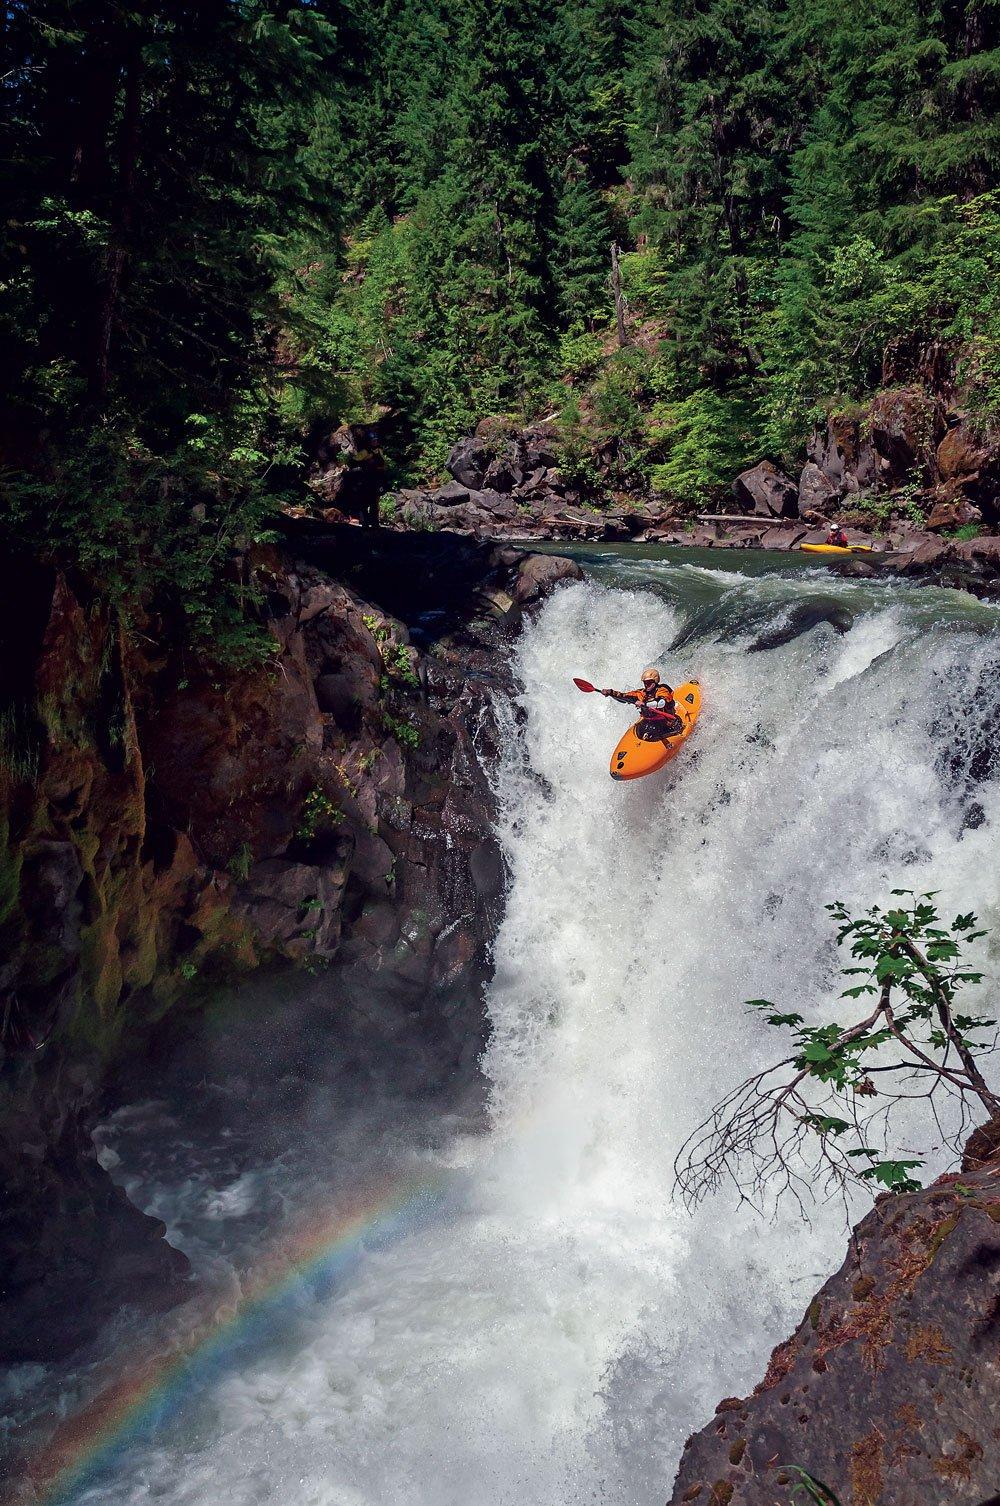 kayaker heading toward a rainbow at the bottom of a waterfall